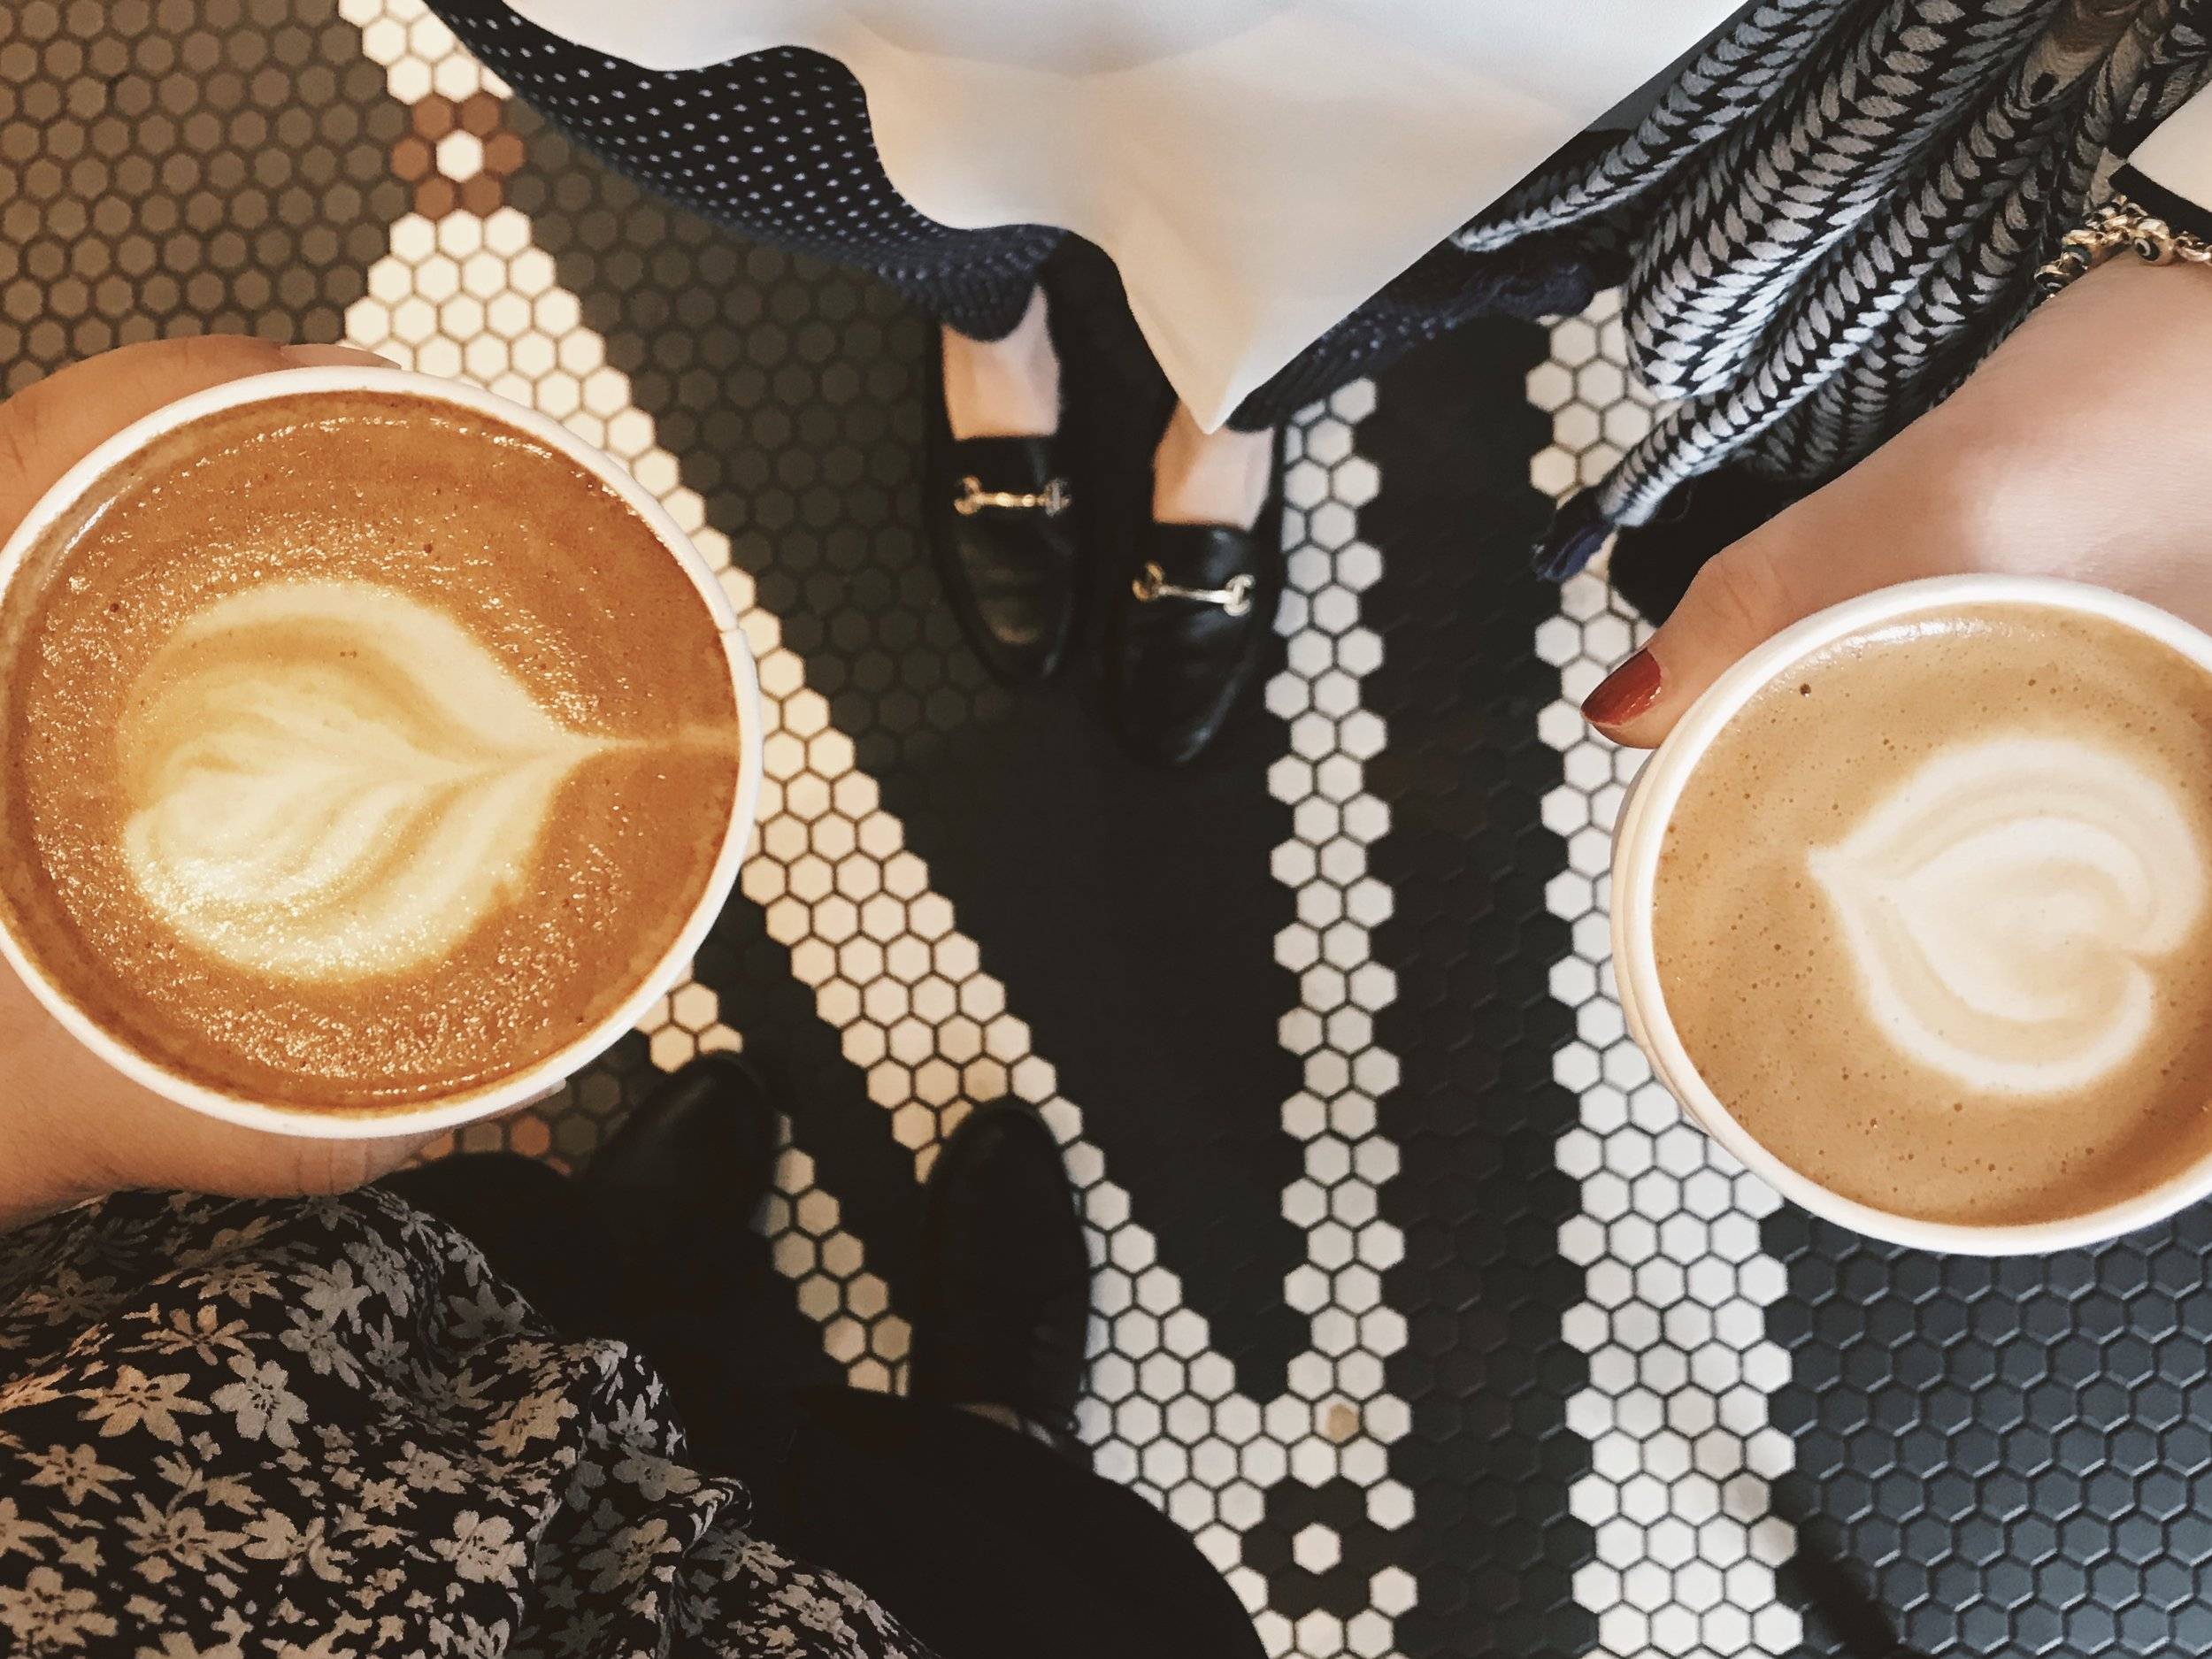 Downtown+Coffee+Guide+Washington+DC+Swings+Raquel+Reyes+3.jpg